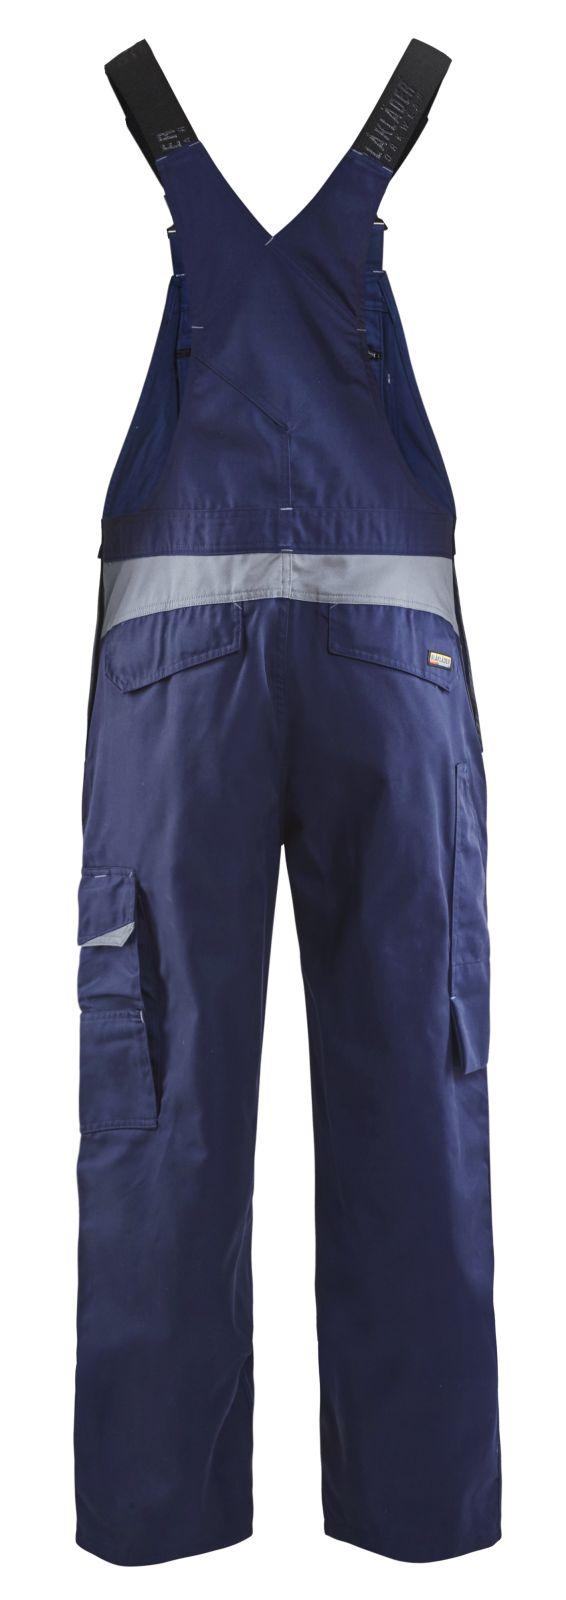 Blaklader Am. Overalls 26641800 marineblauw-grijs(8994)